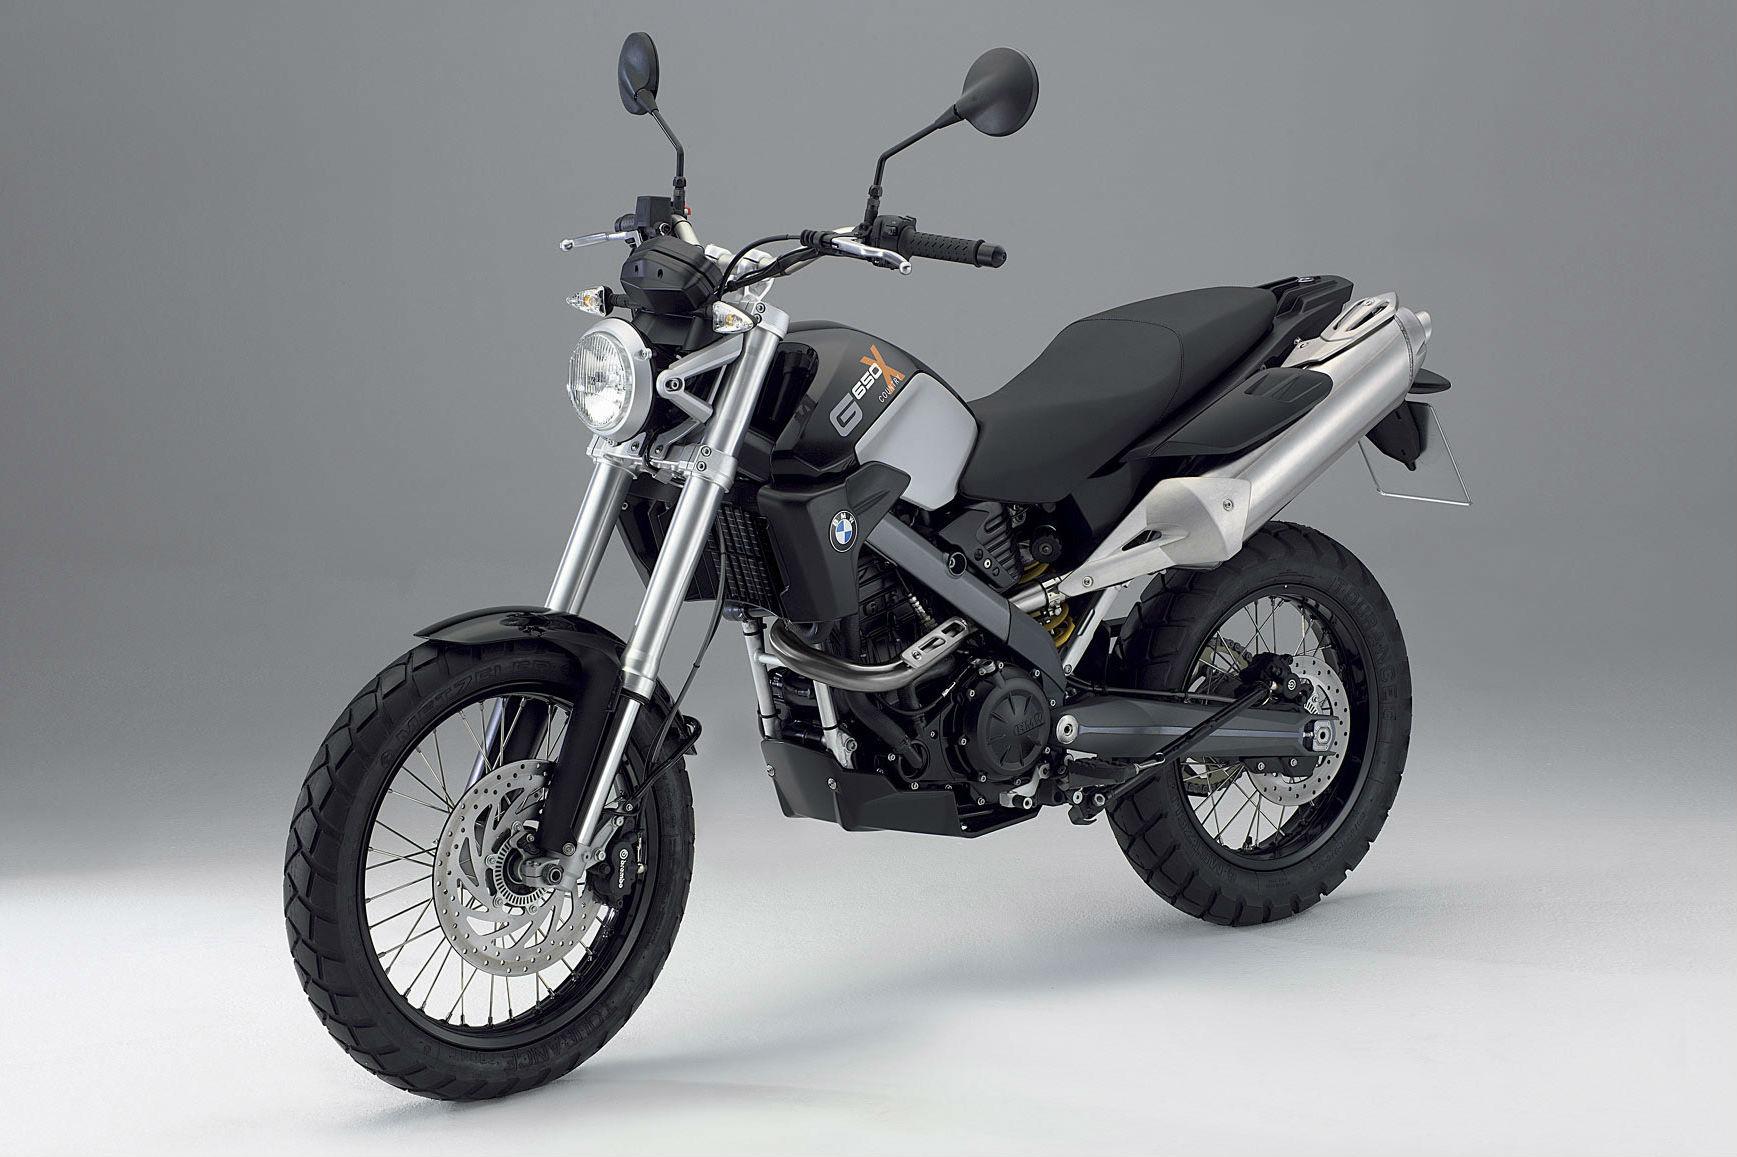 Bmw 350 Enduro Style Model Coming Soon Visordown